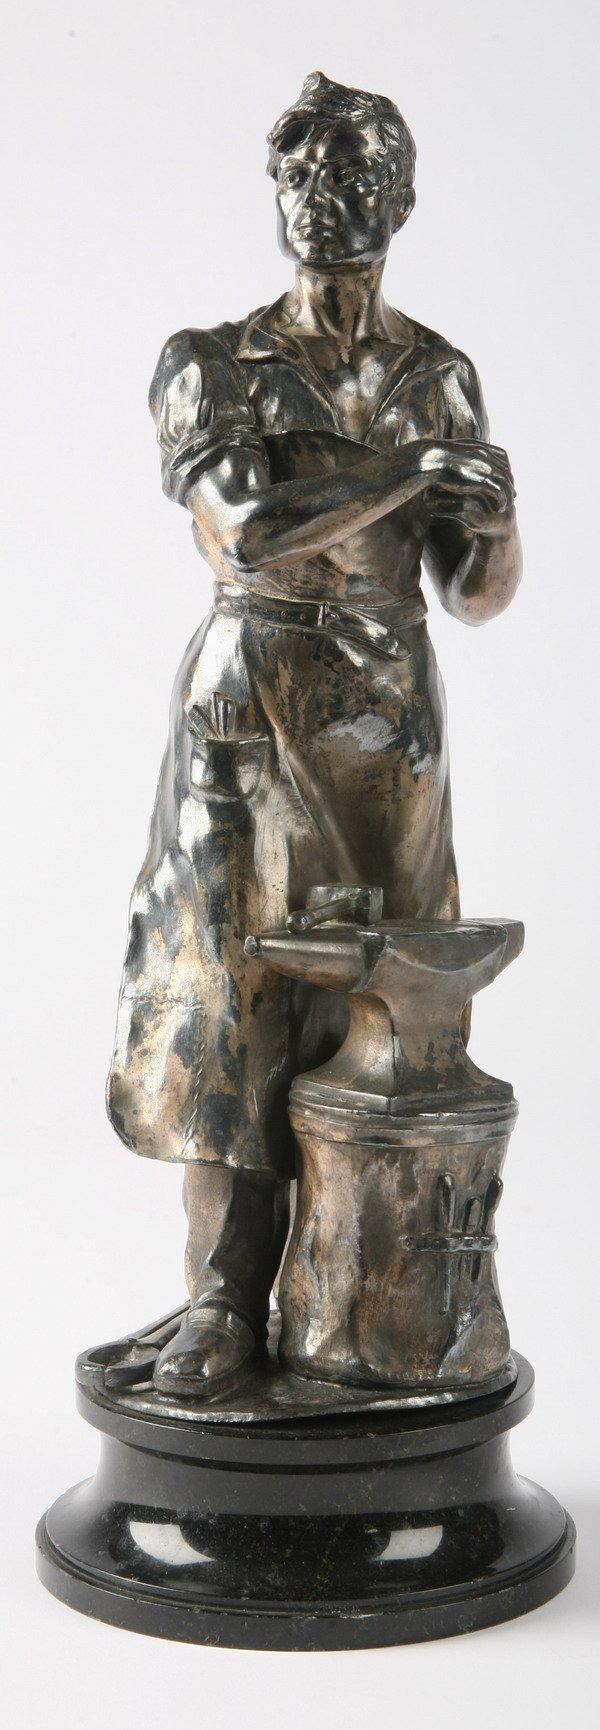 261: 19th century bronze sculpture